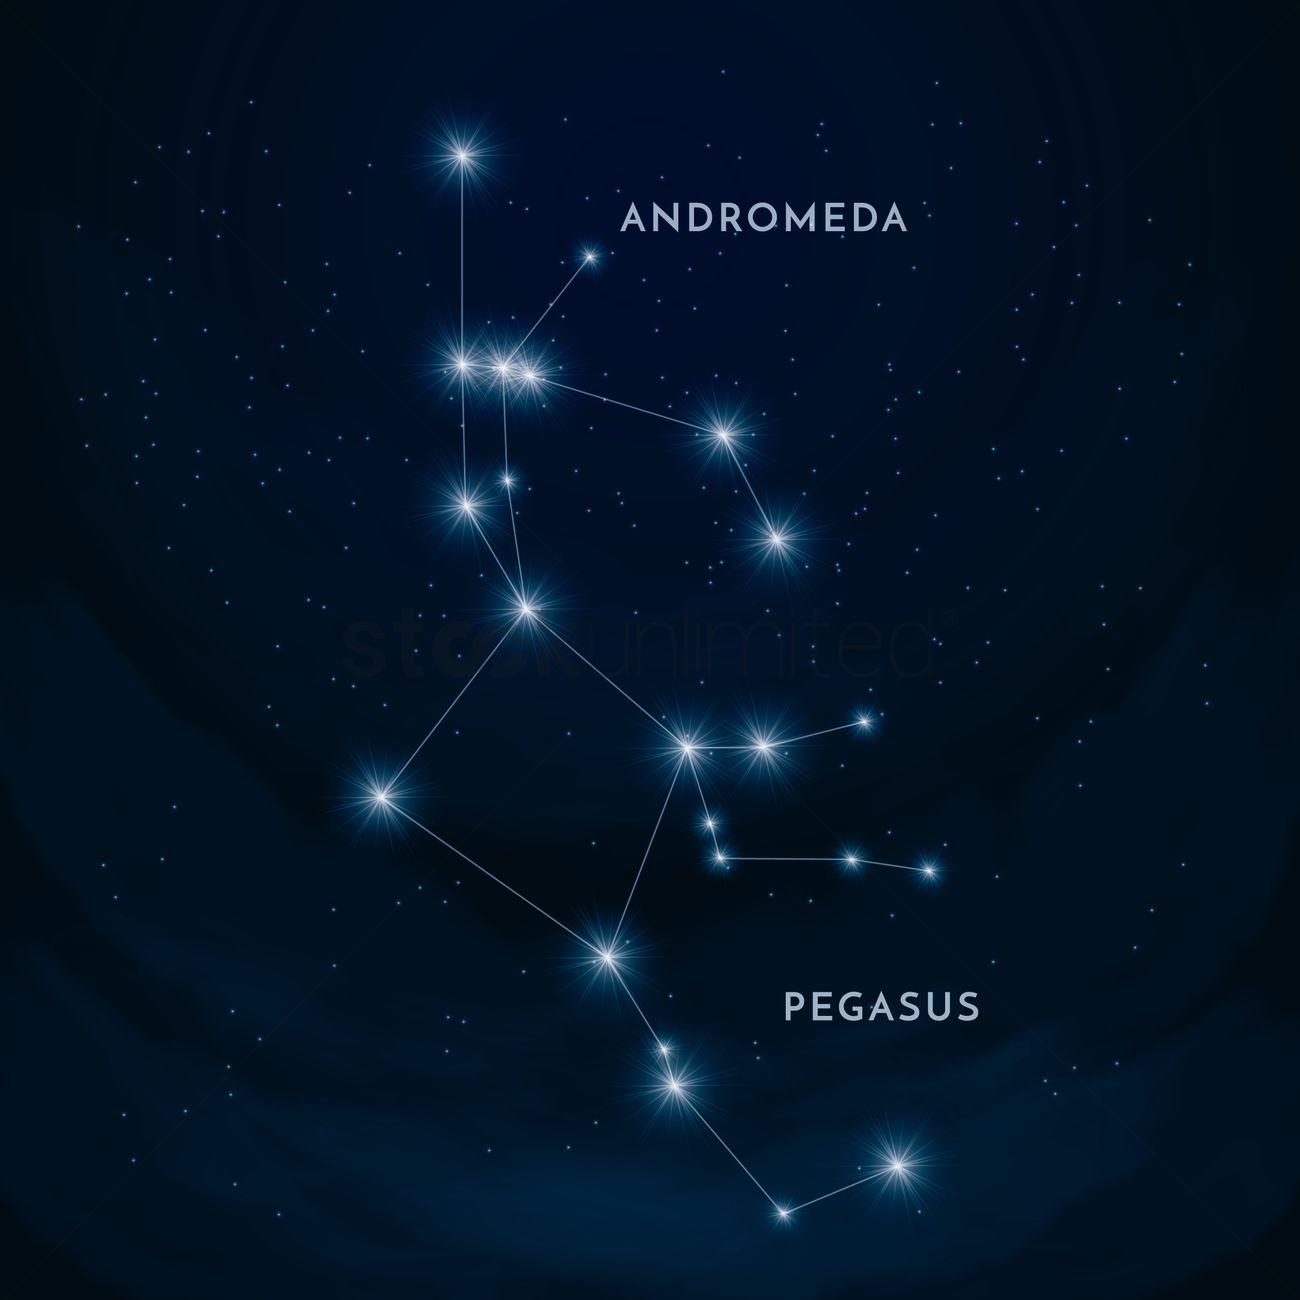 Andromeda (constellation) - Wikipedia